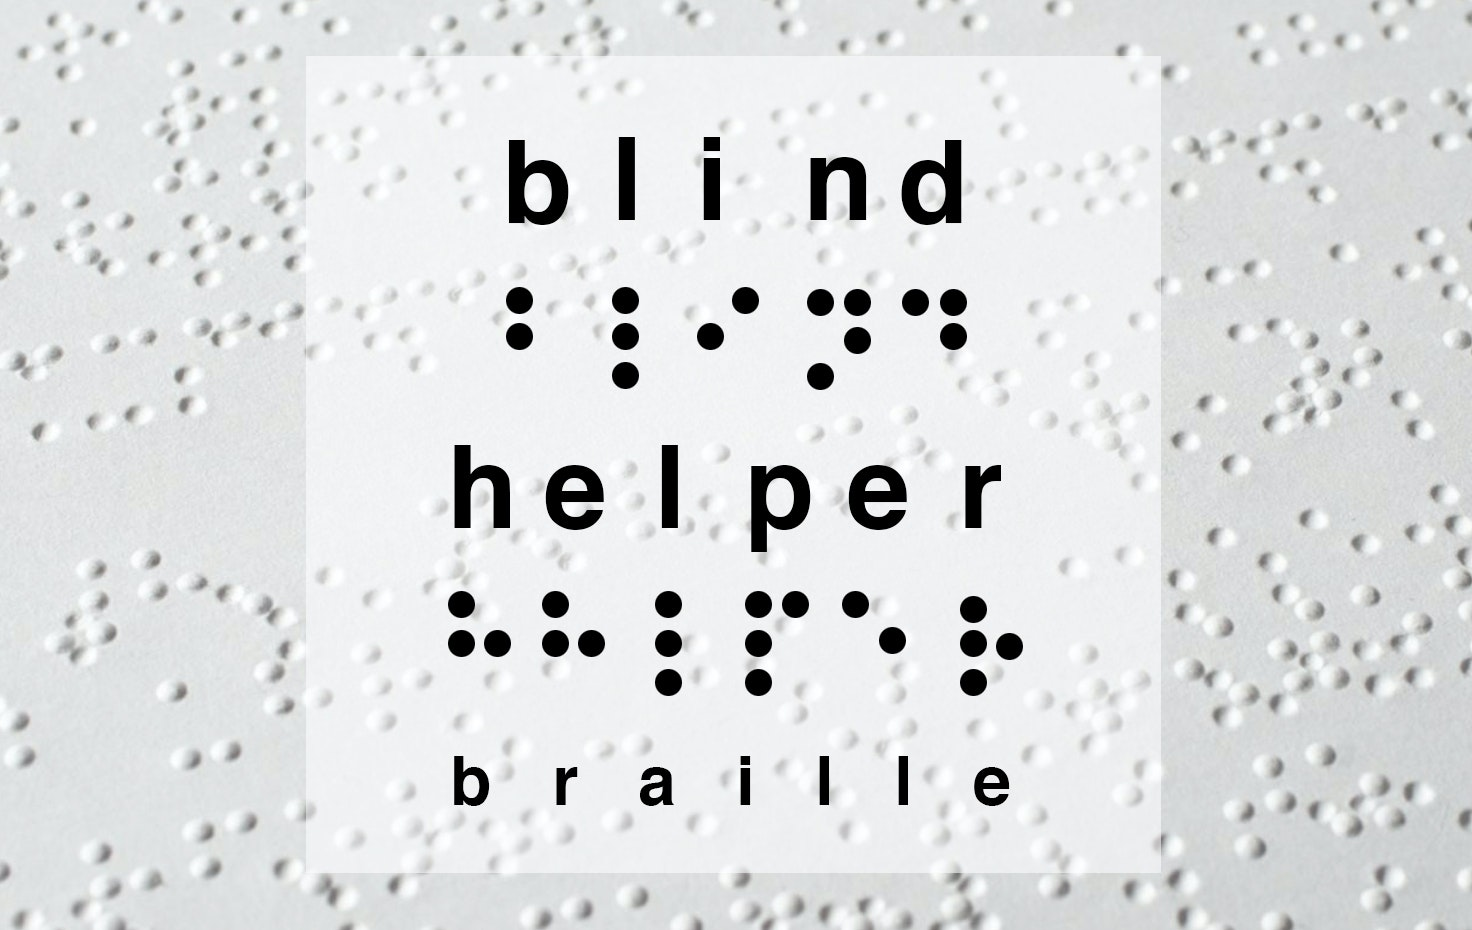 BlindHelperBraille